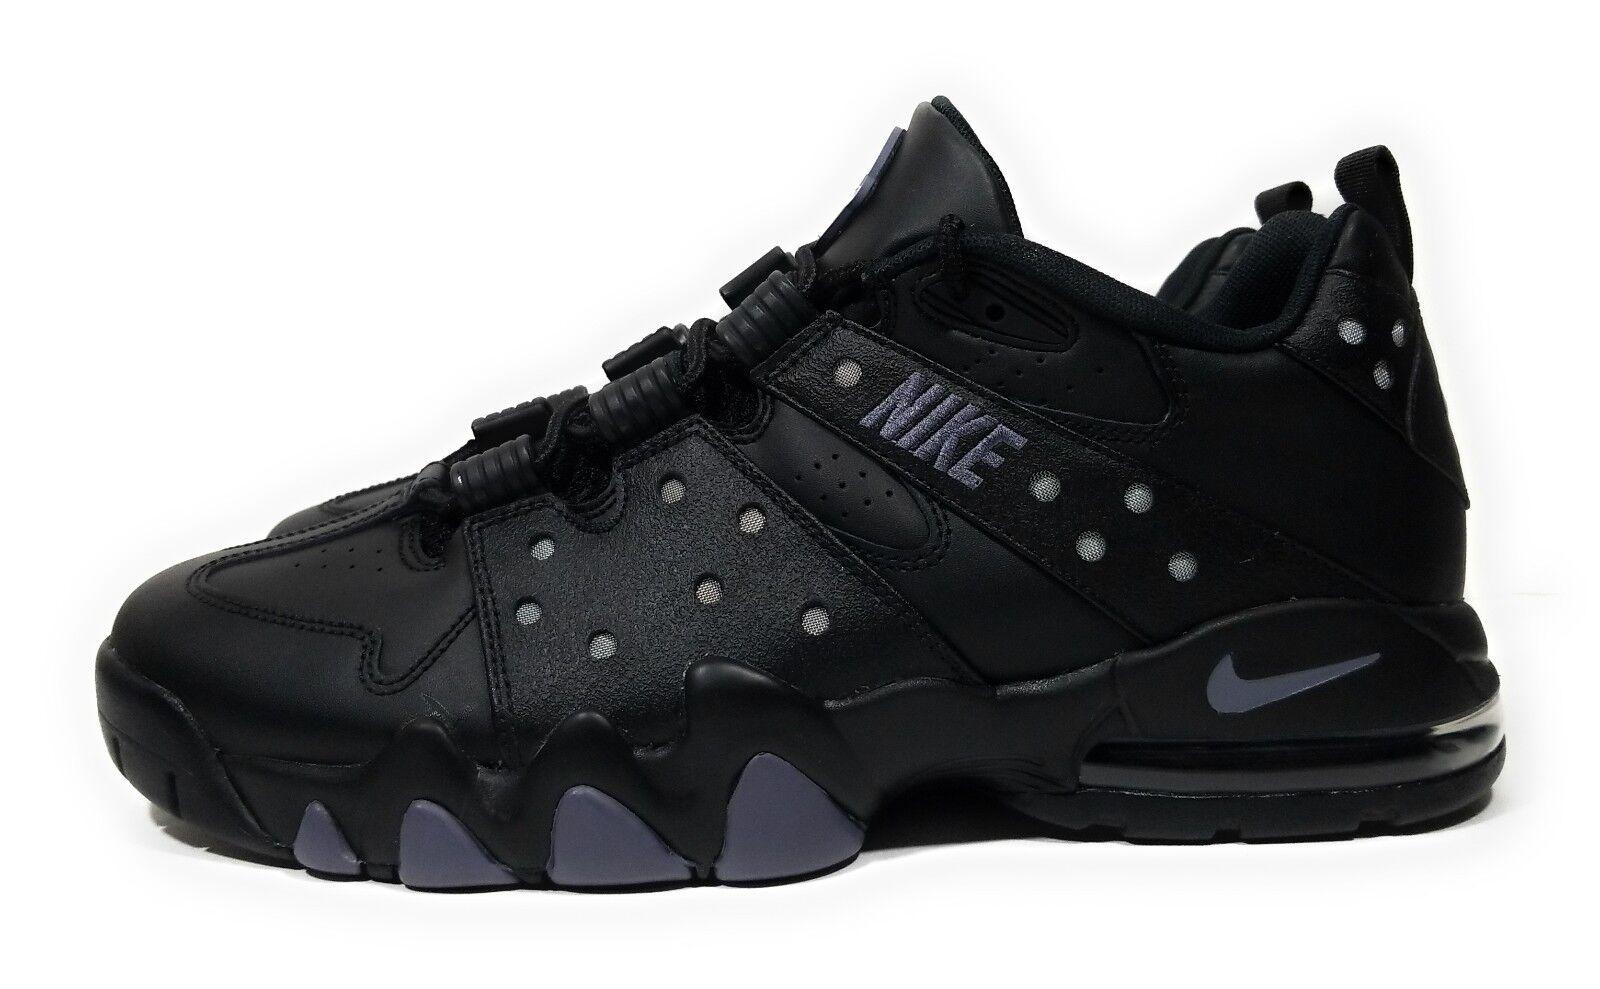 Nike Air Max 2 CB 94 Low Mens Basketball Shoes Black Size 12